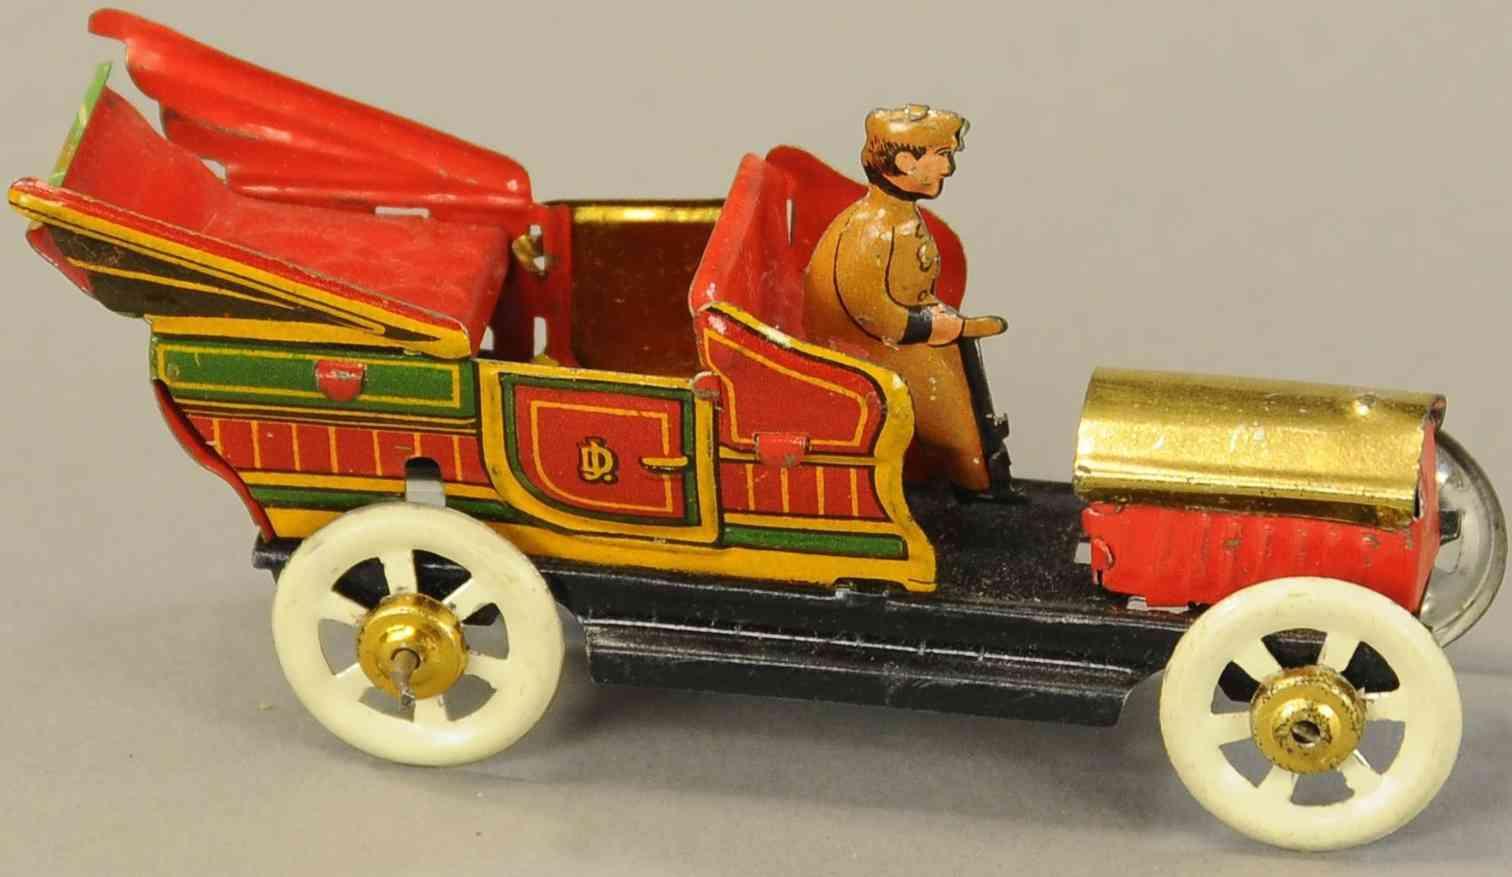 distler penny toy offene limousine taxi schwungradantrieb cancy container